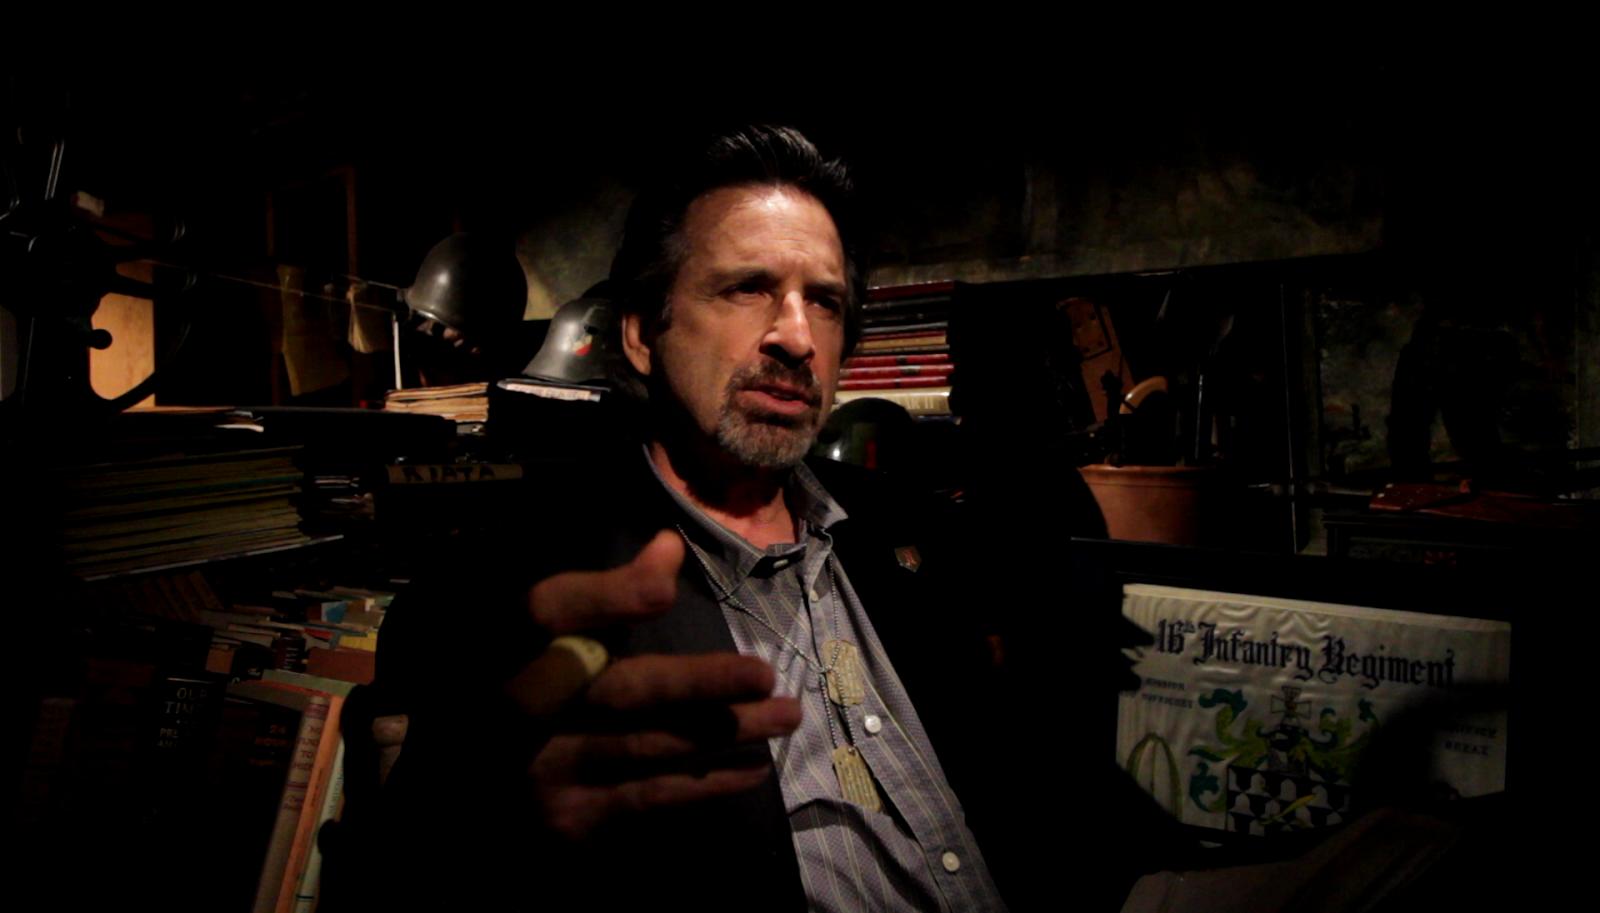 Robert Carradine interview, Samantha Fuller's A Fuller Life documentary